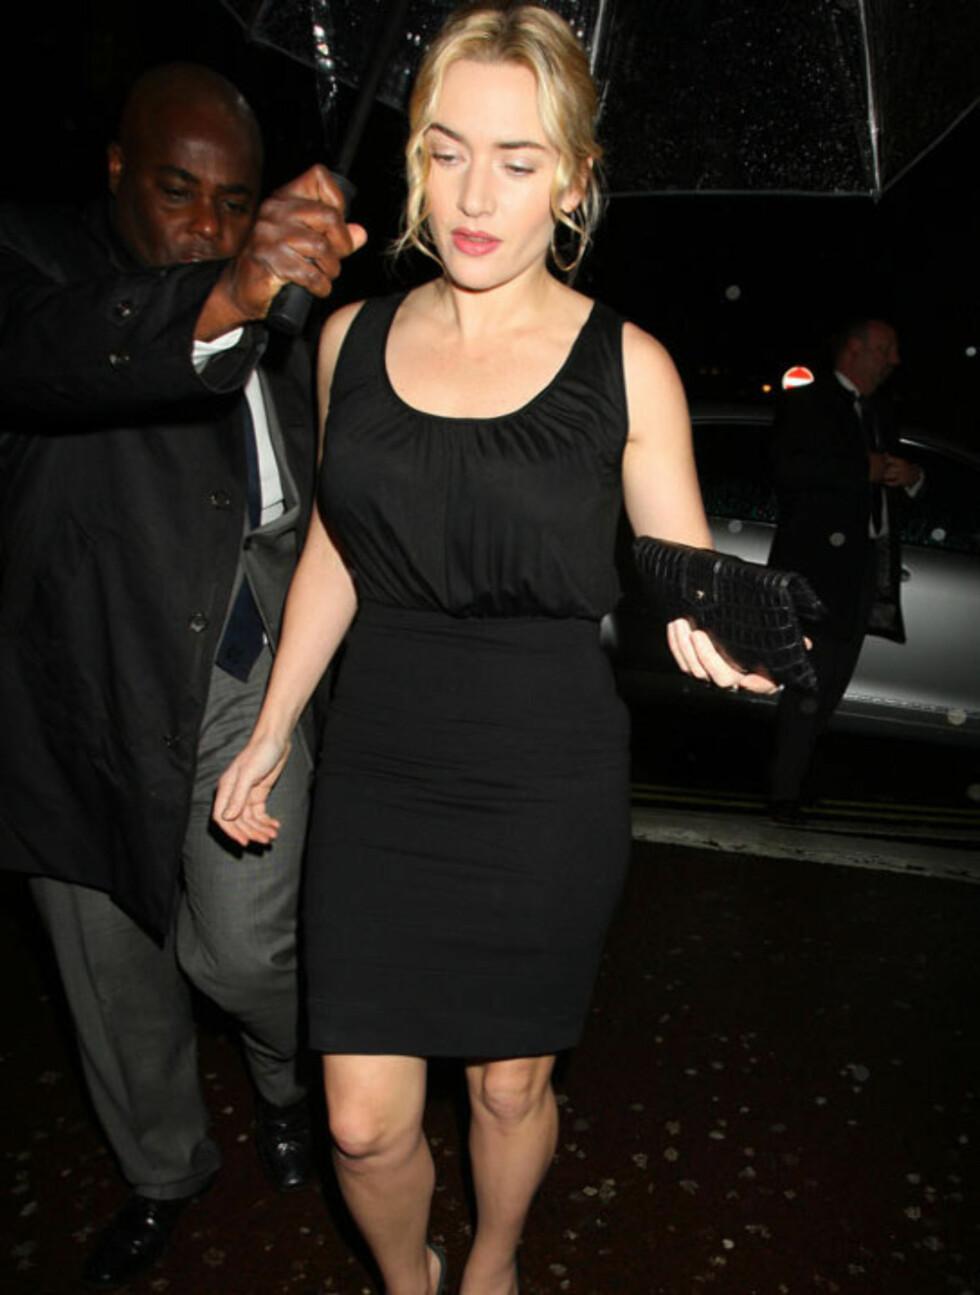 LEKKER: Skuespiller Kate Winslet ankommer BAFTA-hovedkvarteret i  Piccadilly, London i vinter. Foto: All Over Press